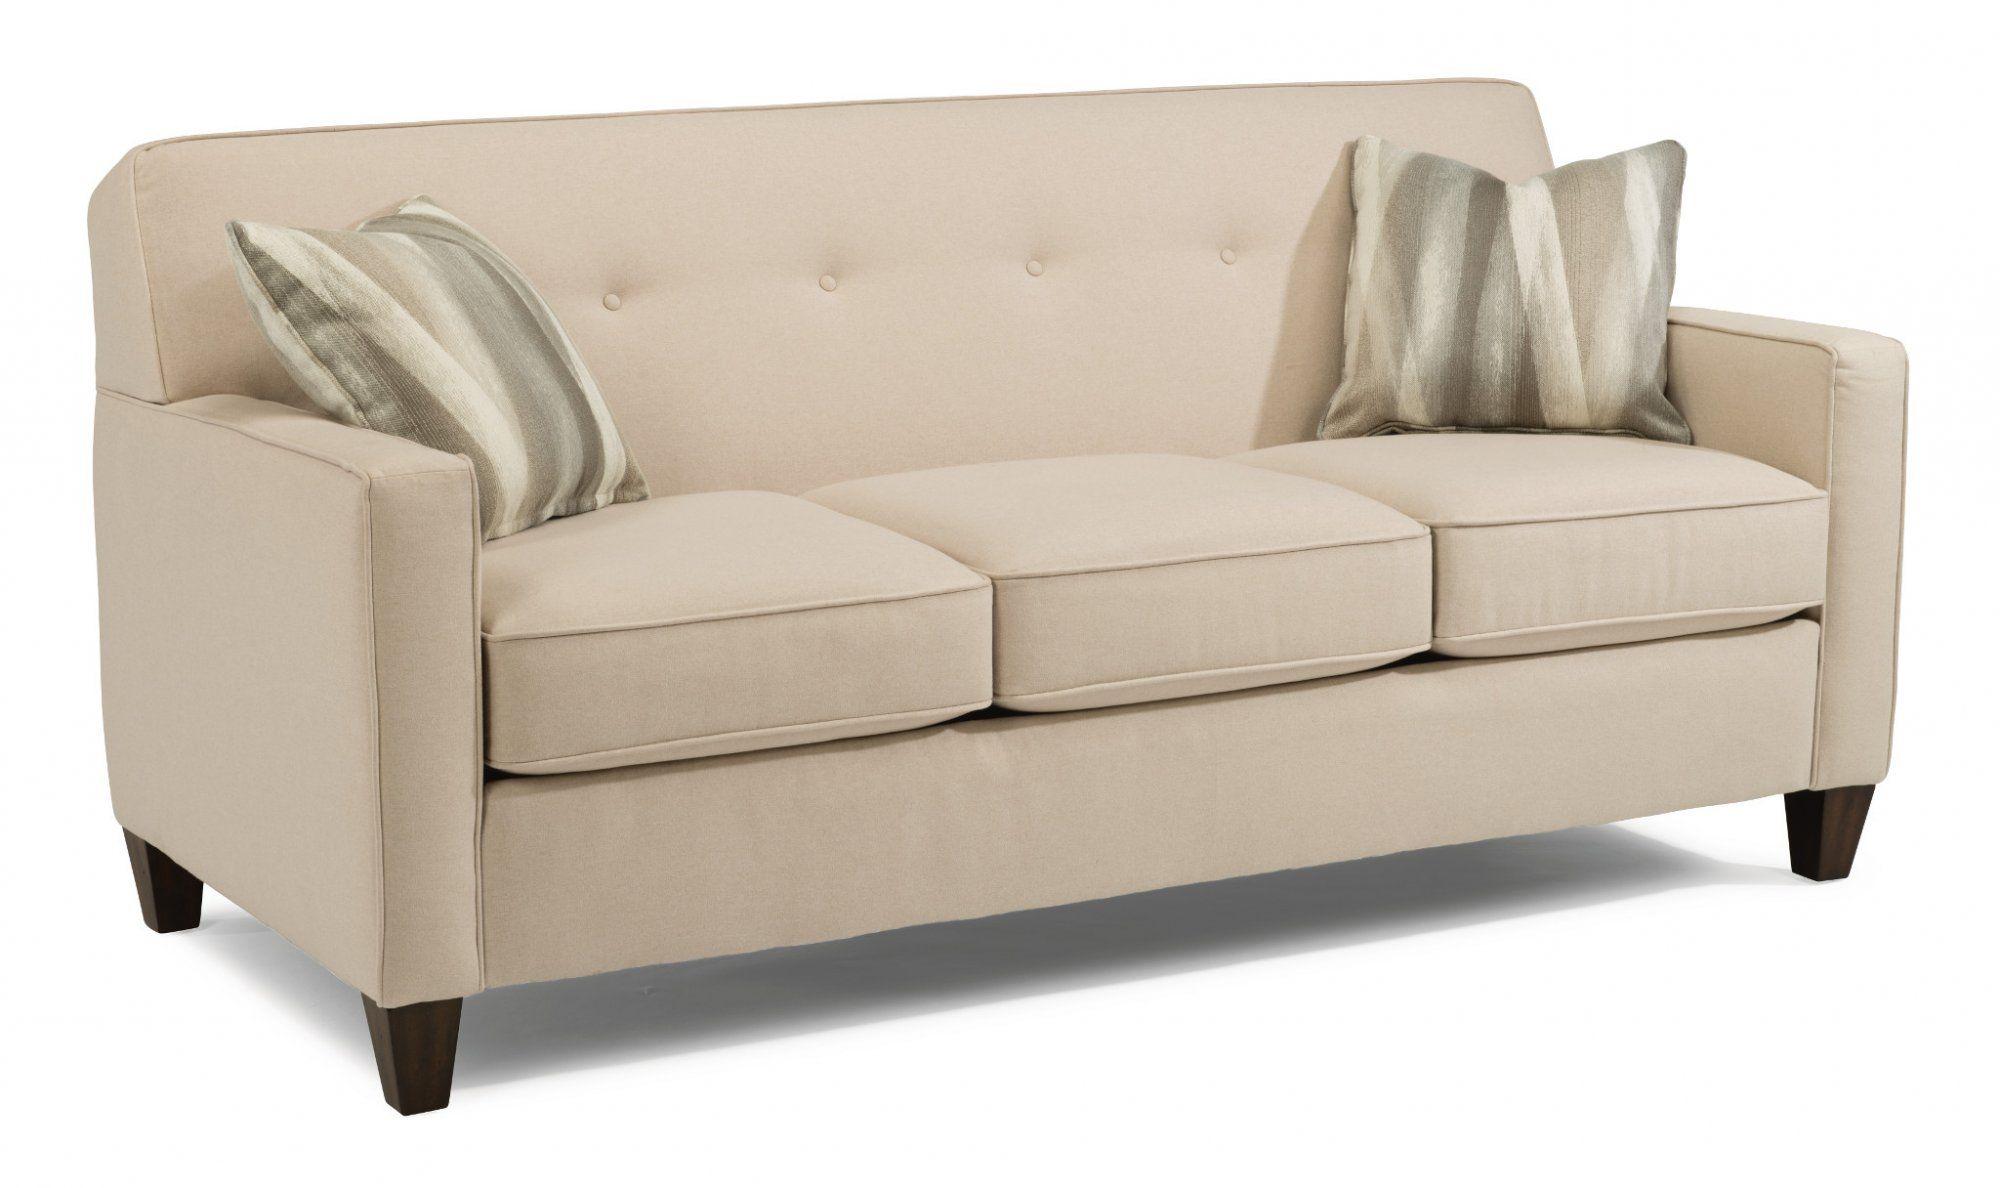 - Pull Out Sofa Bett, Twin Size Modernen Sofa Loveseat Sleeper Sofa